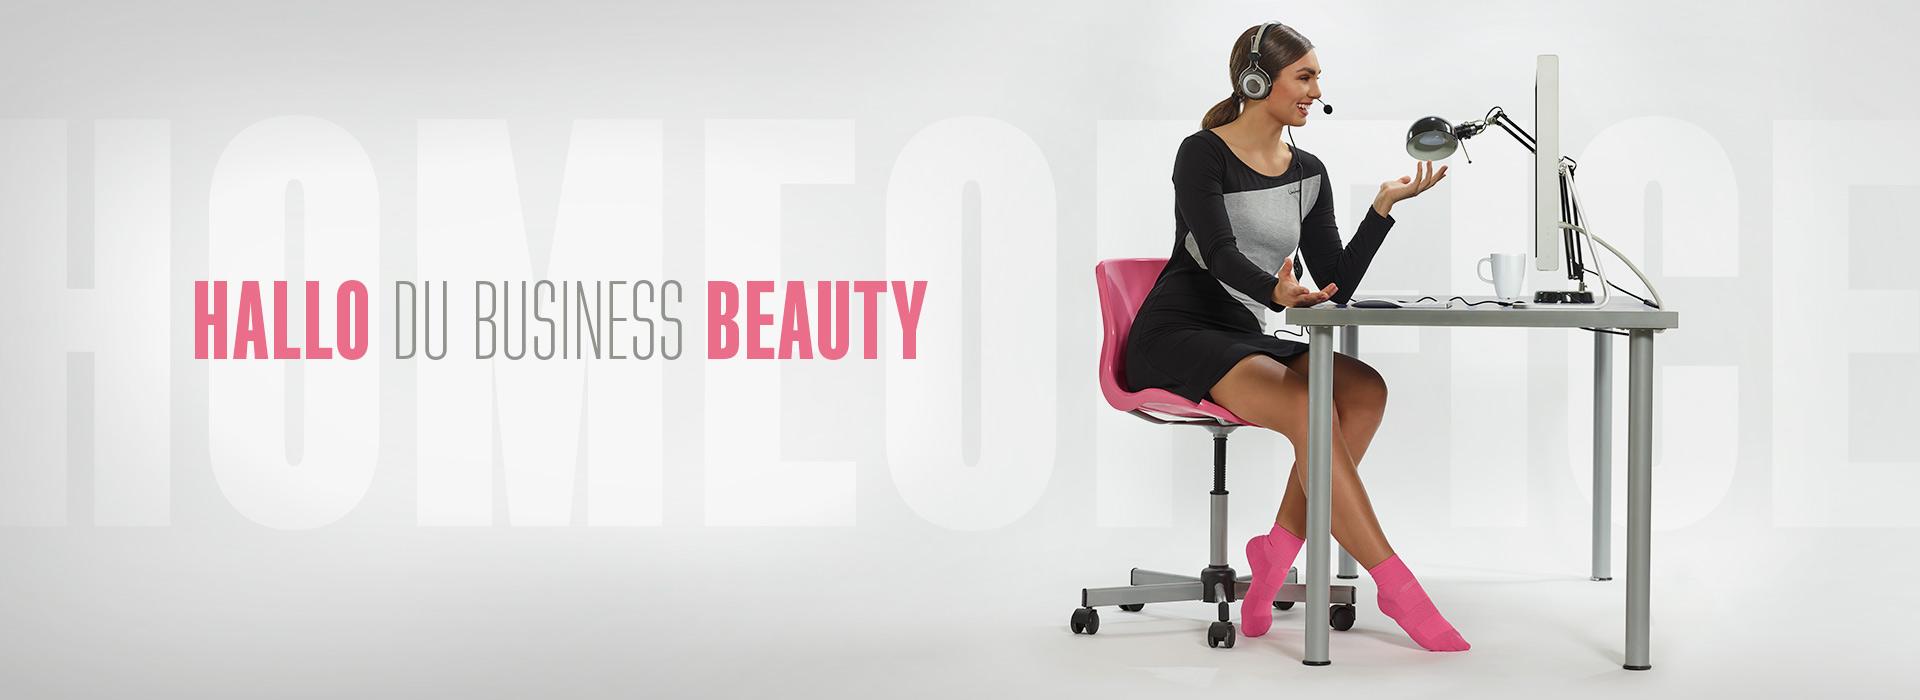 Business beauty